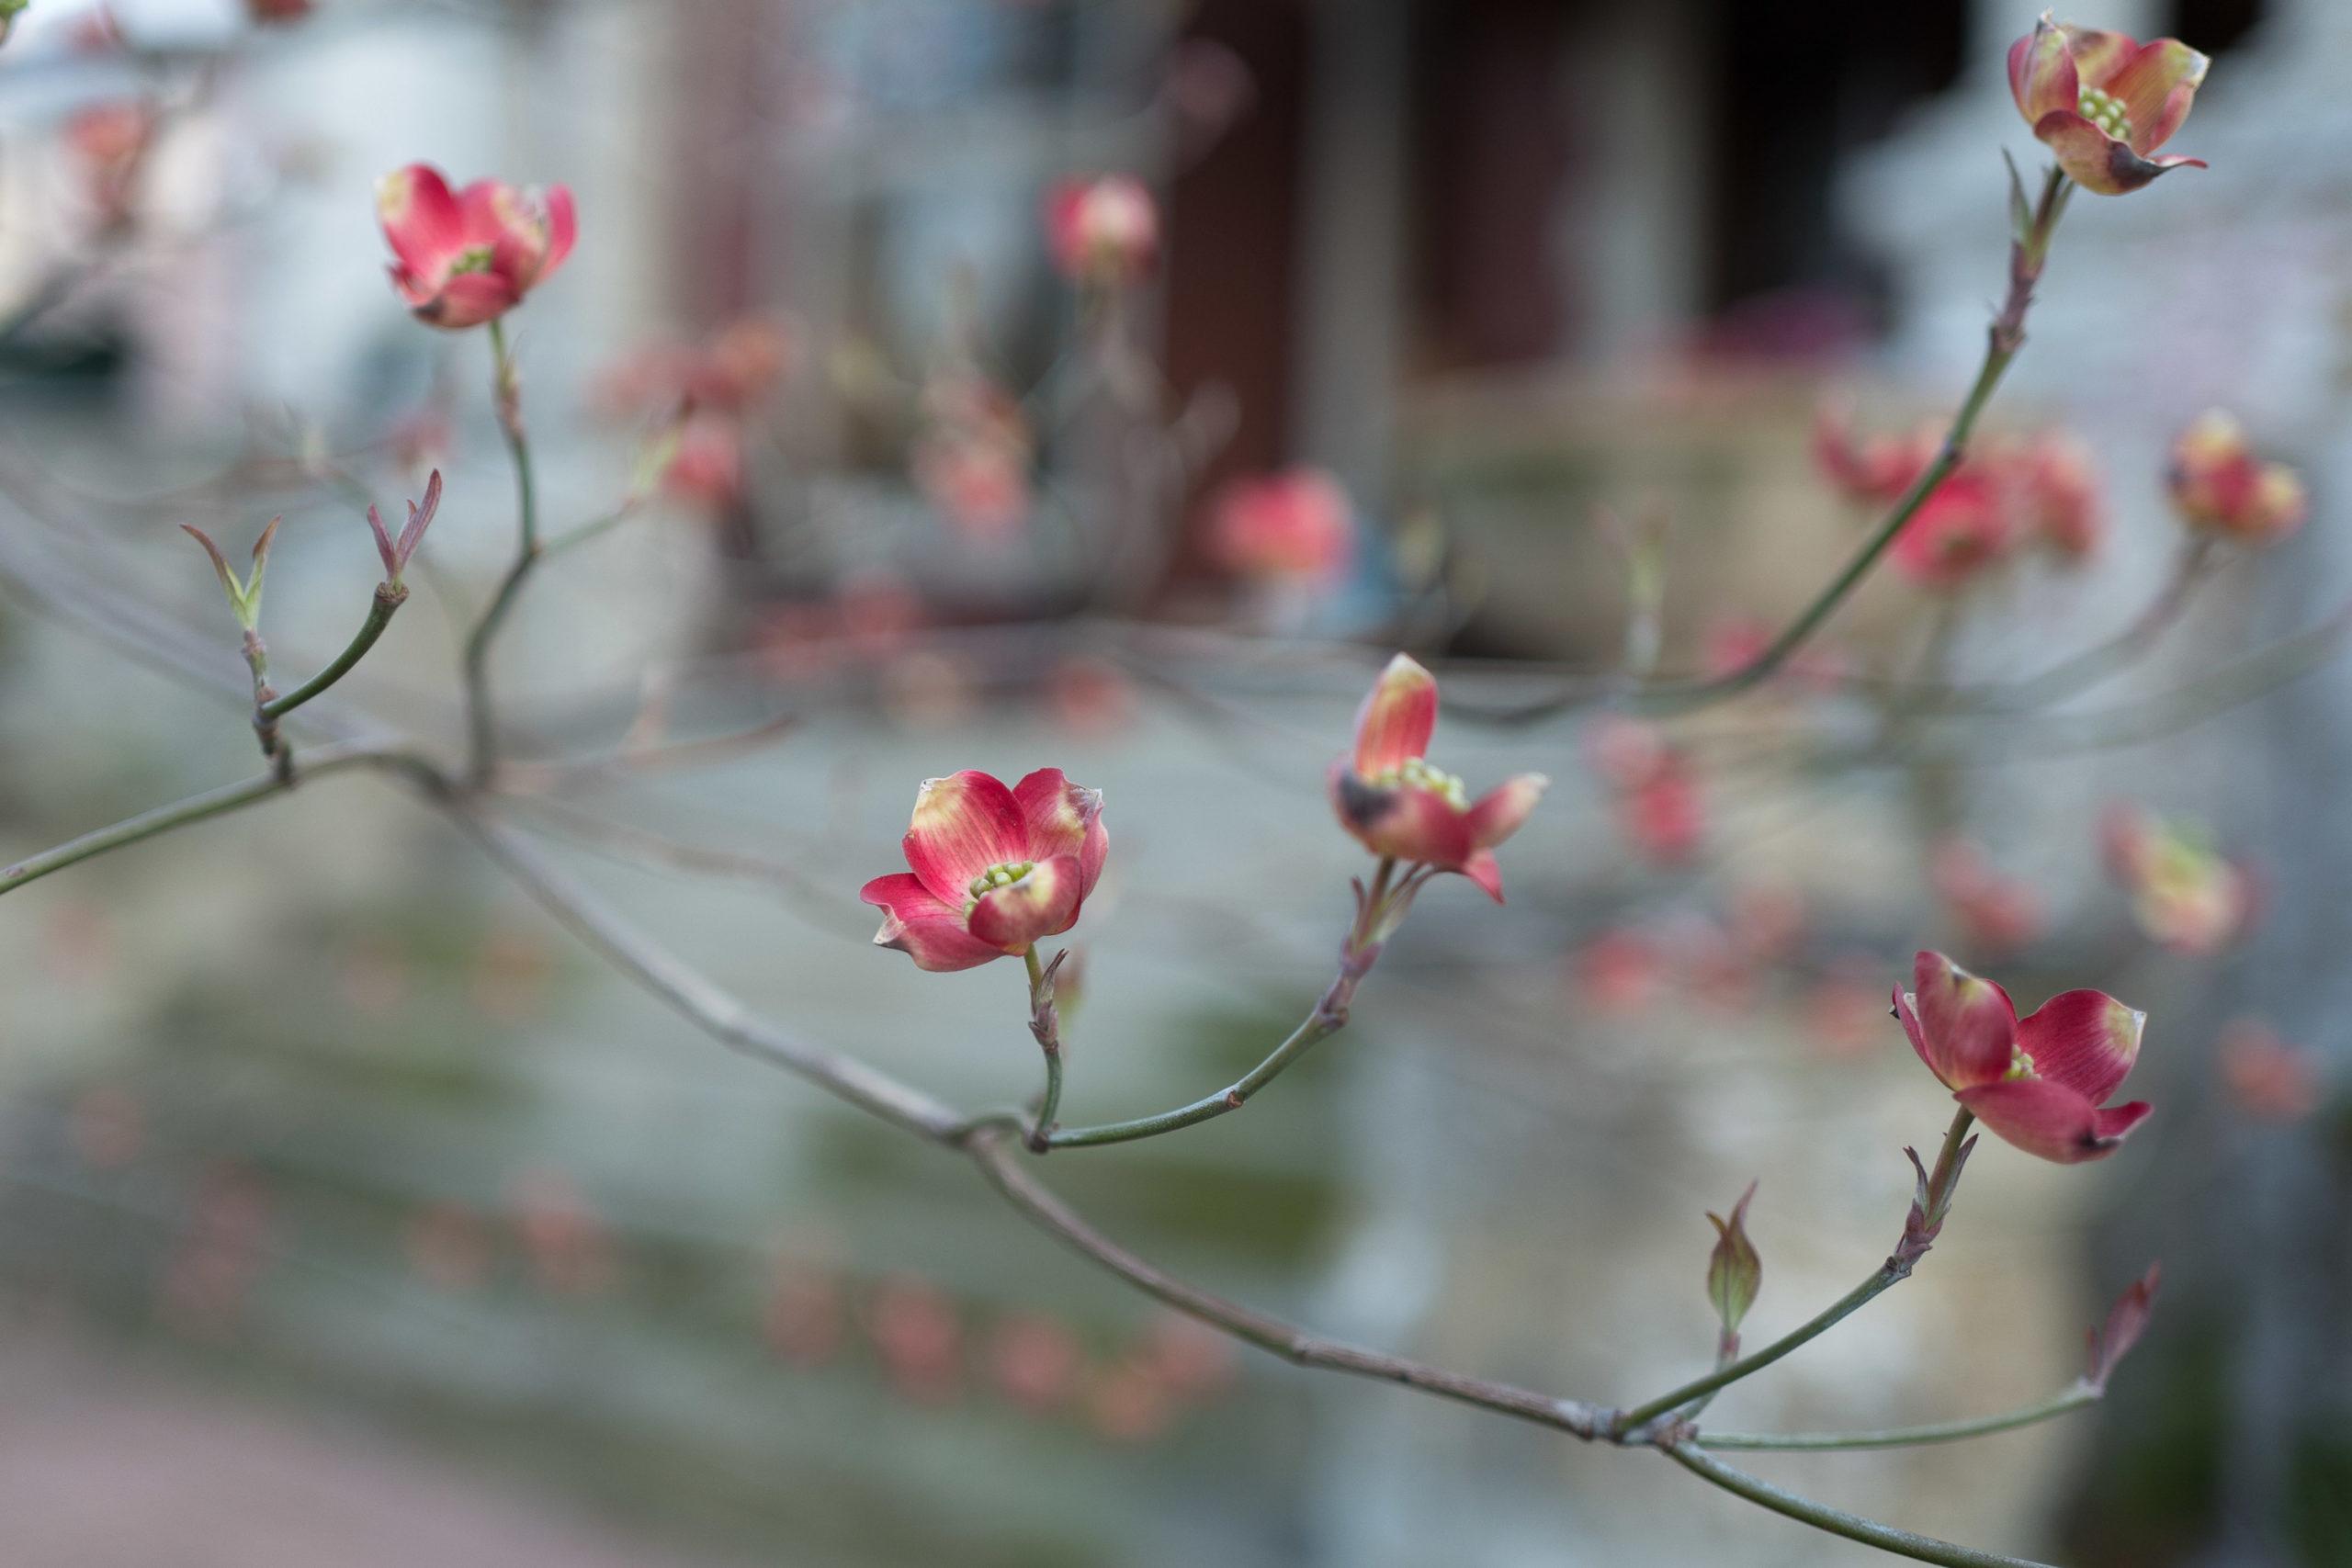 Dogwood tree in blooom